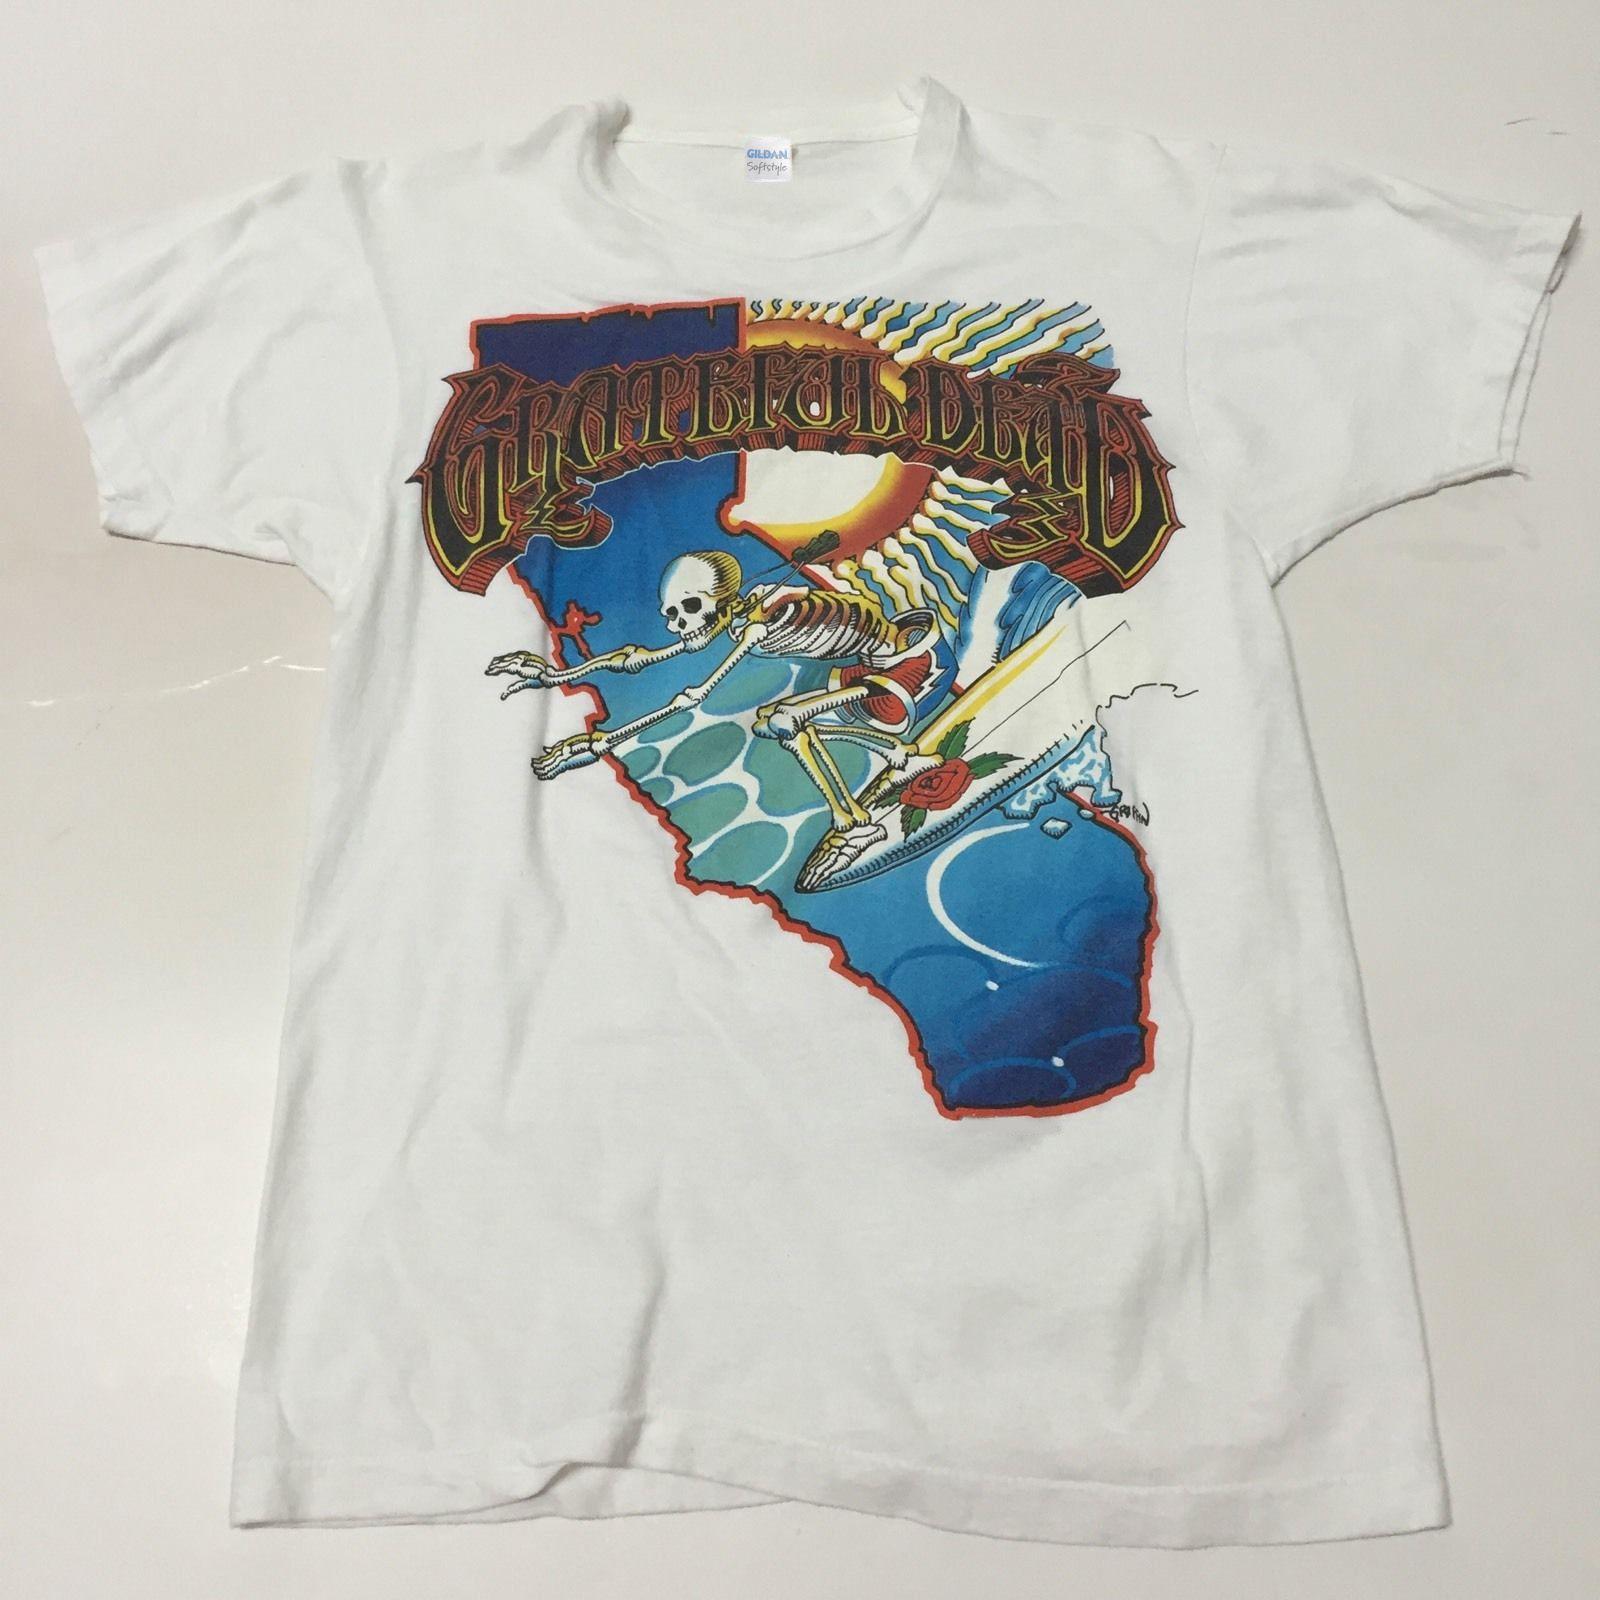 258892d51 Grateful Dead T Shirt Rick Griffin Art Surfing Skeleton SurfBoar USA SIZE  Print Shirt Long Sleeve Tee Shirts From Printkrd, $10.38| DHgate.Com